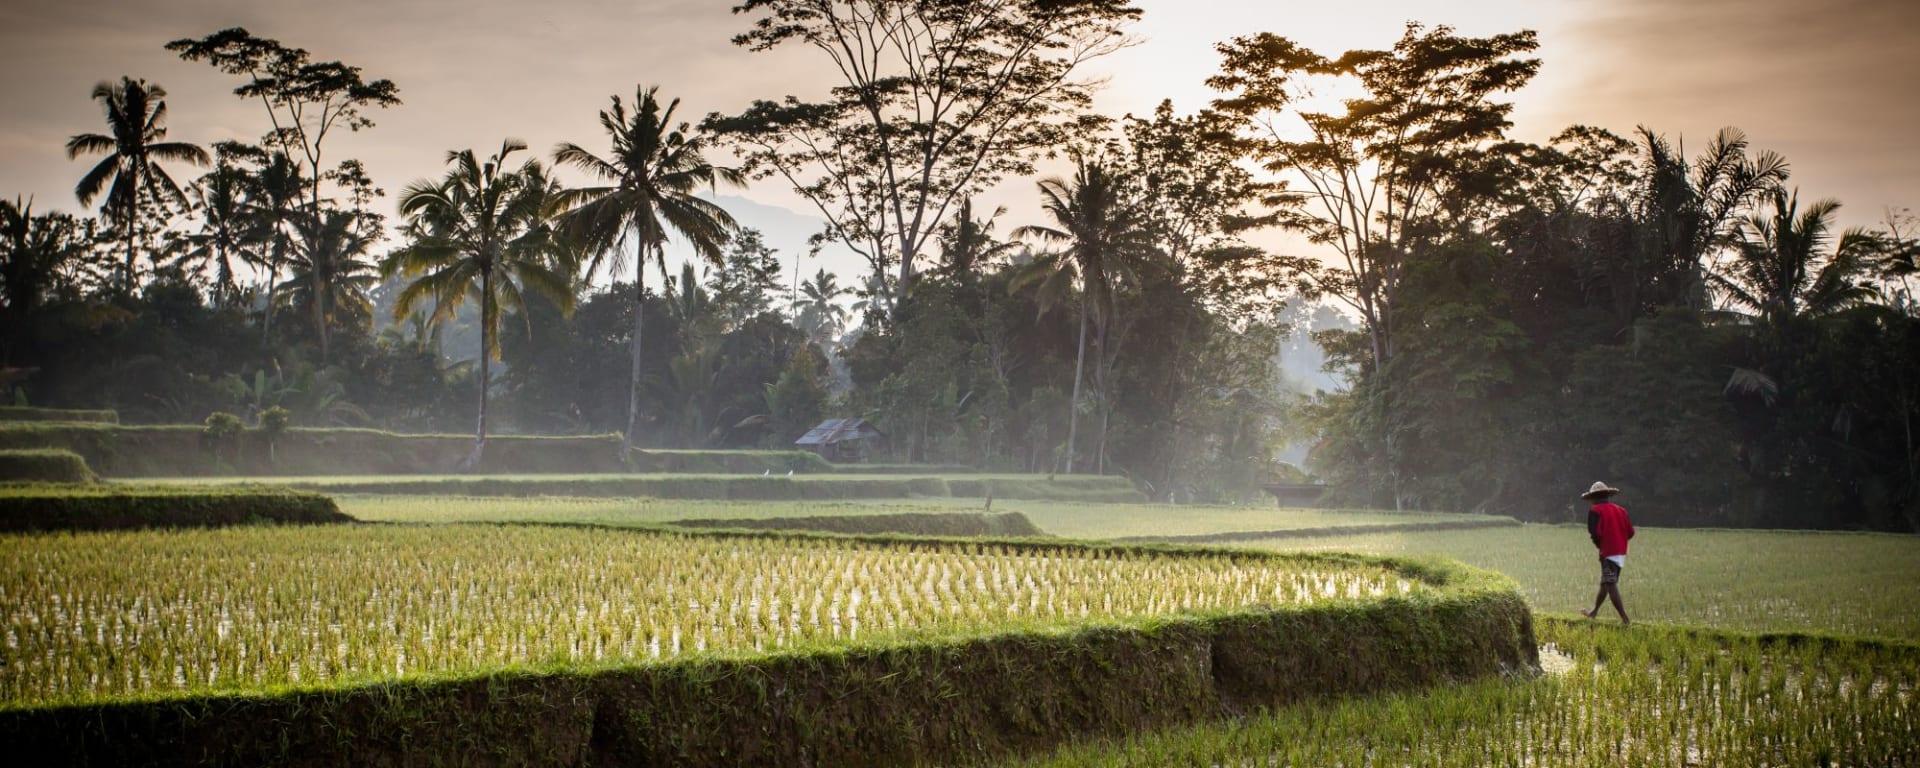 Bali compacte de Sud de Bali: Bali Ubud Rice field